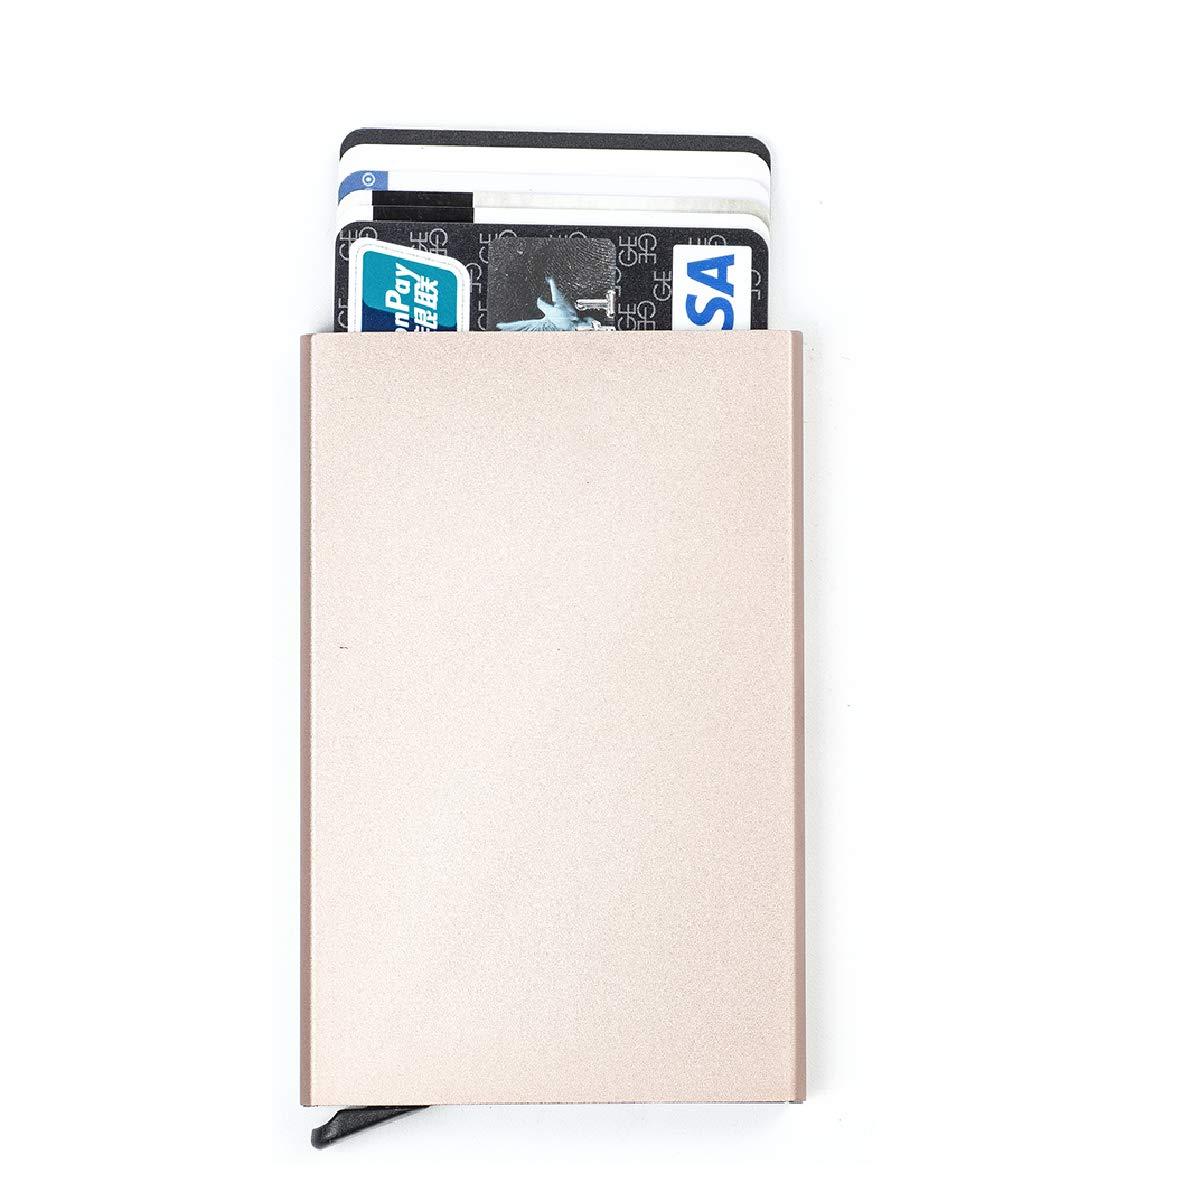 Ultrad/ünn Kartenhalter f/ür 6-8 Karten Silber TRIWONDER Aluminium Kreditkartenetui Damen und Herren kreditkartenh/ülle RFID